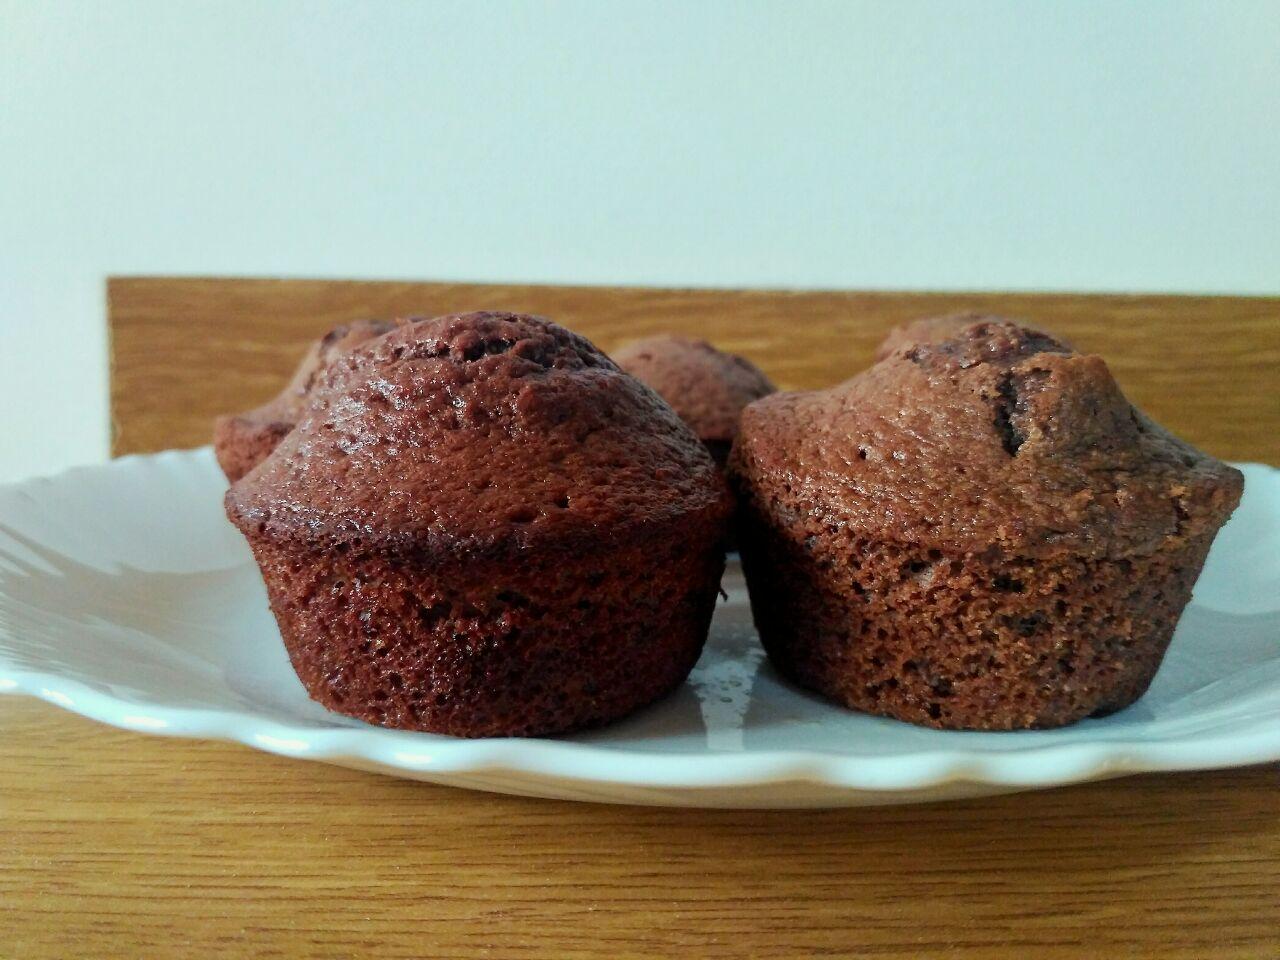 Dolci senza burro: muffin banane e cacao, soffici e gustosi!